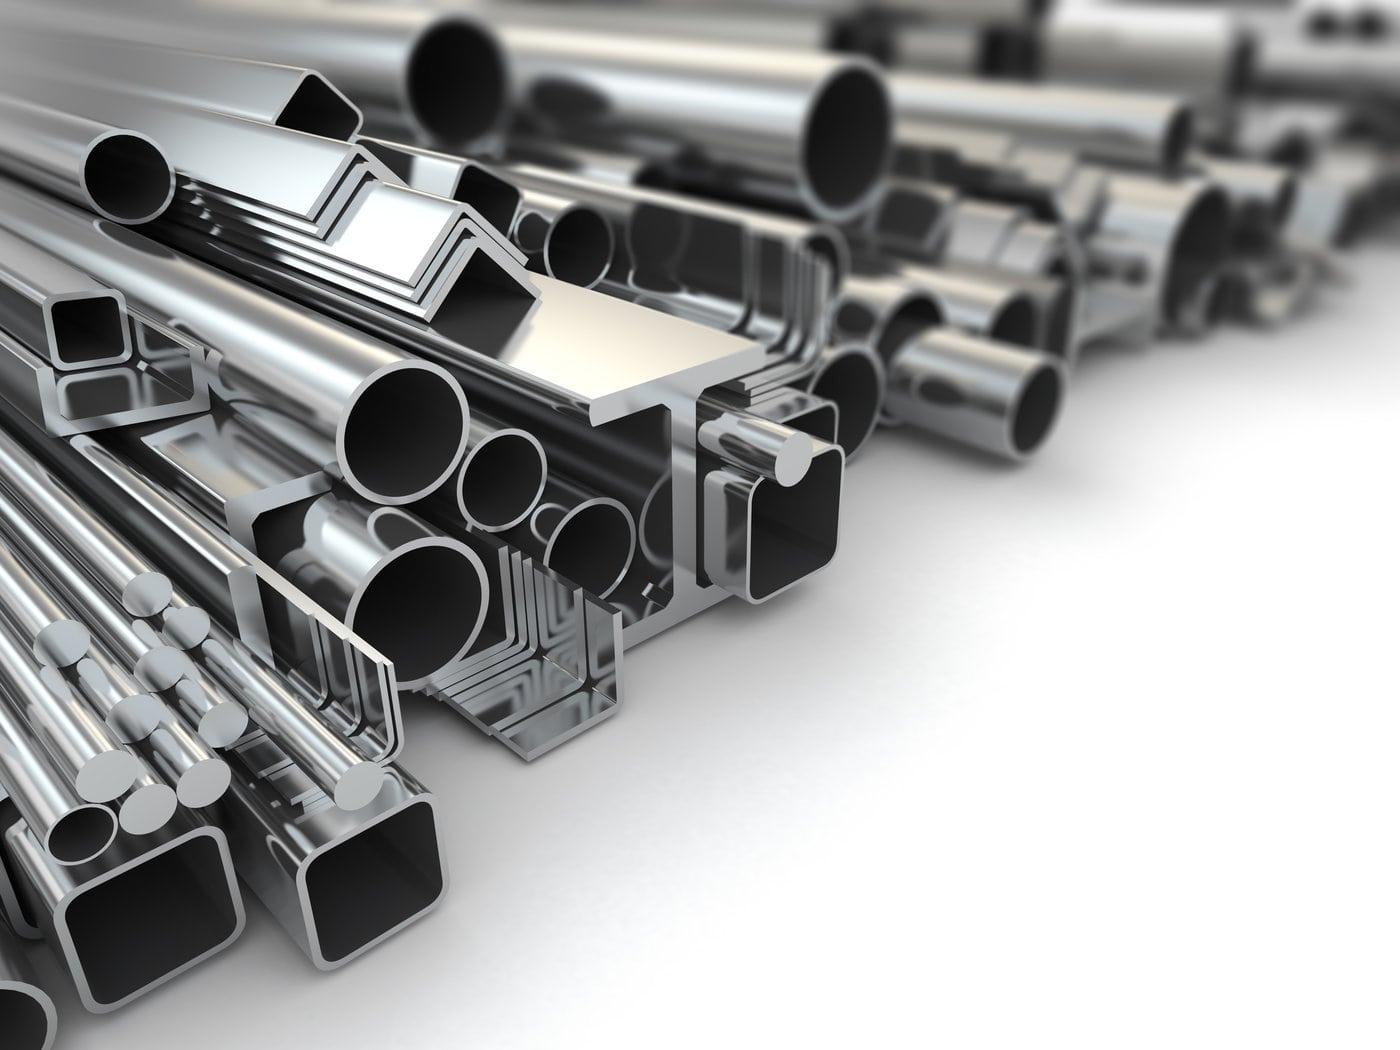 Tata Steel's SE آسیا برای تحت فشار ماندن: Edelweiss